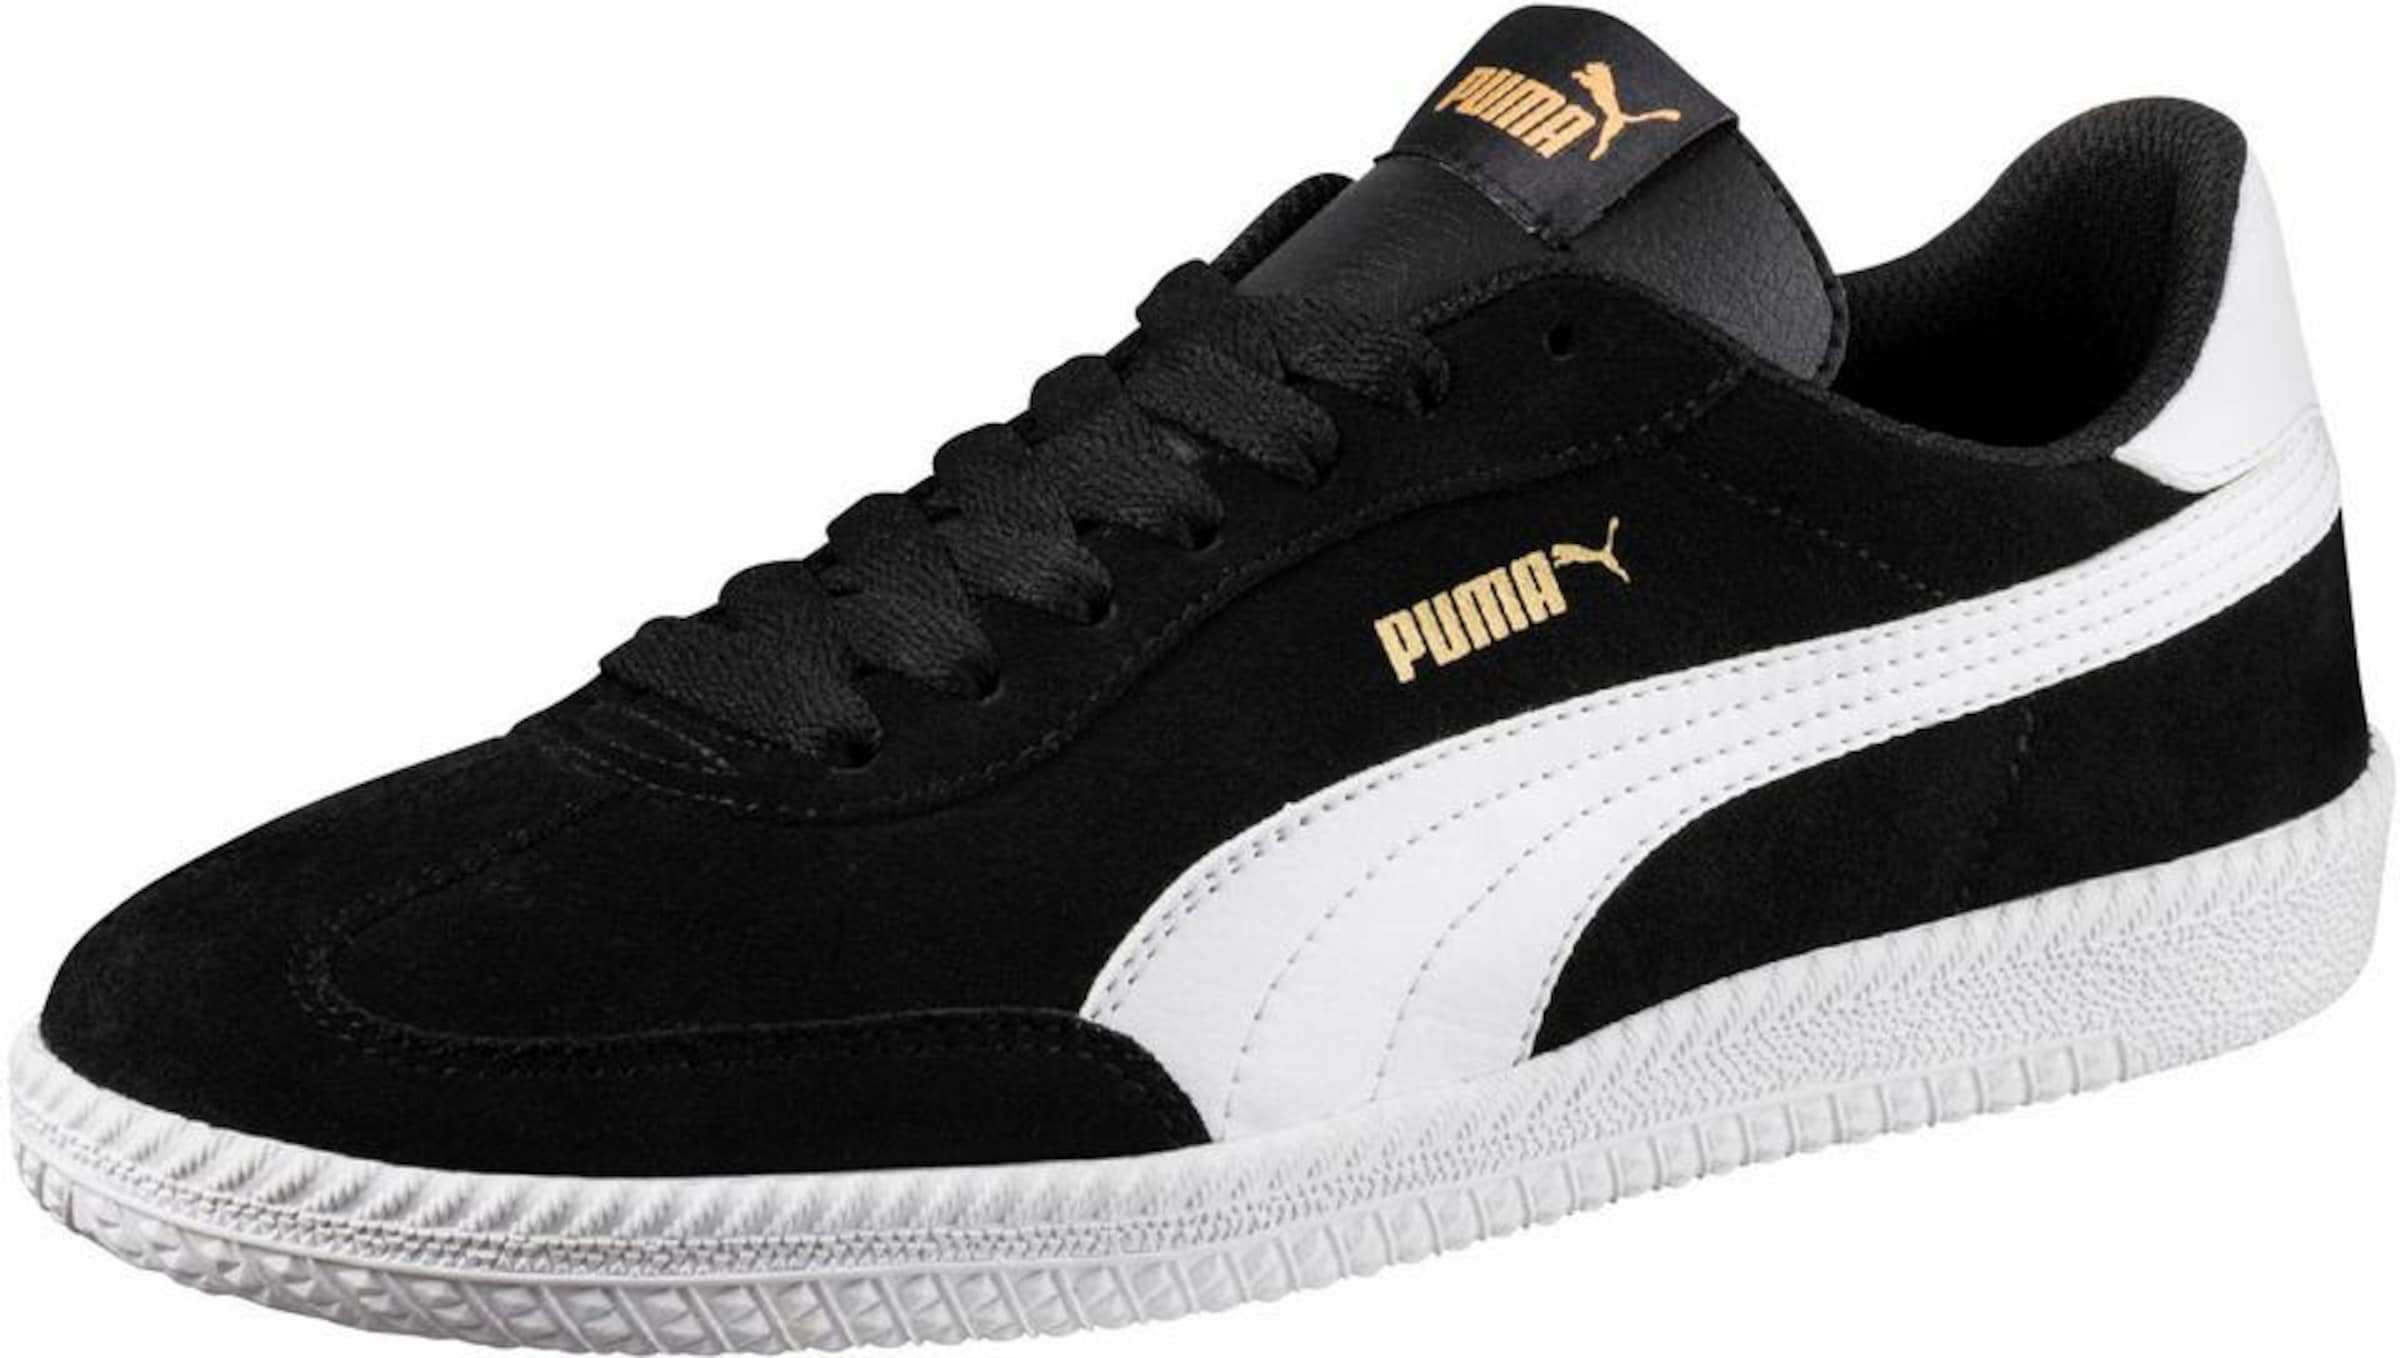 PUMA Sneaker Astro Cup Verschleißfeste billige Schuhe